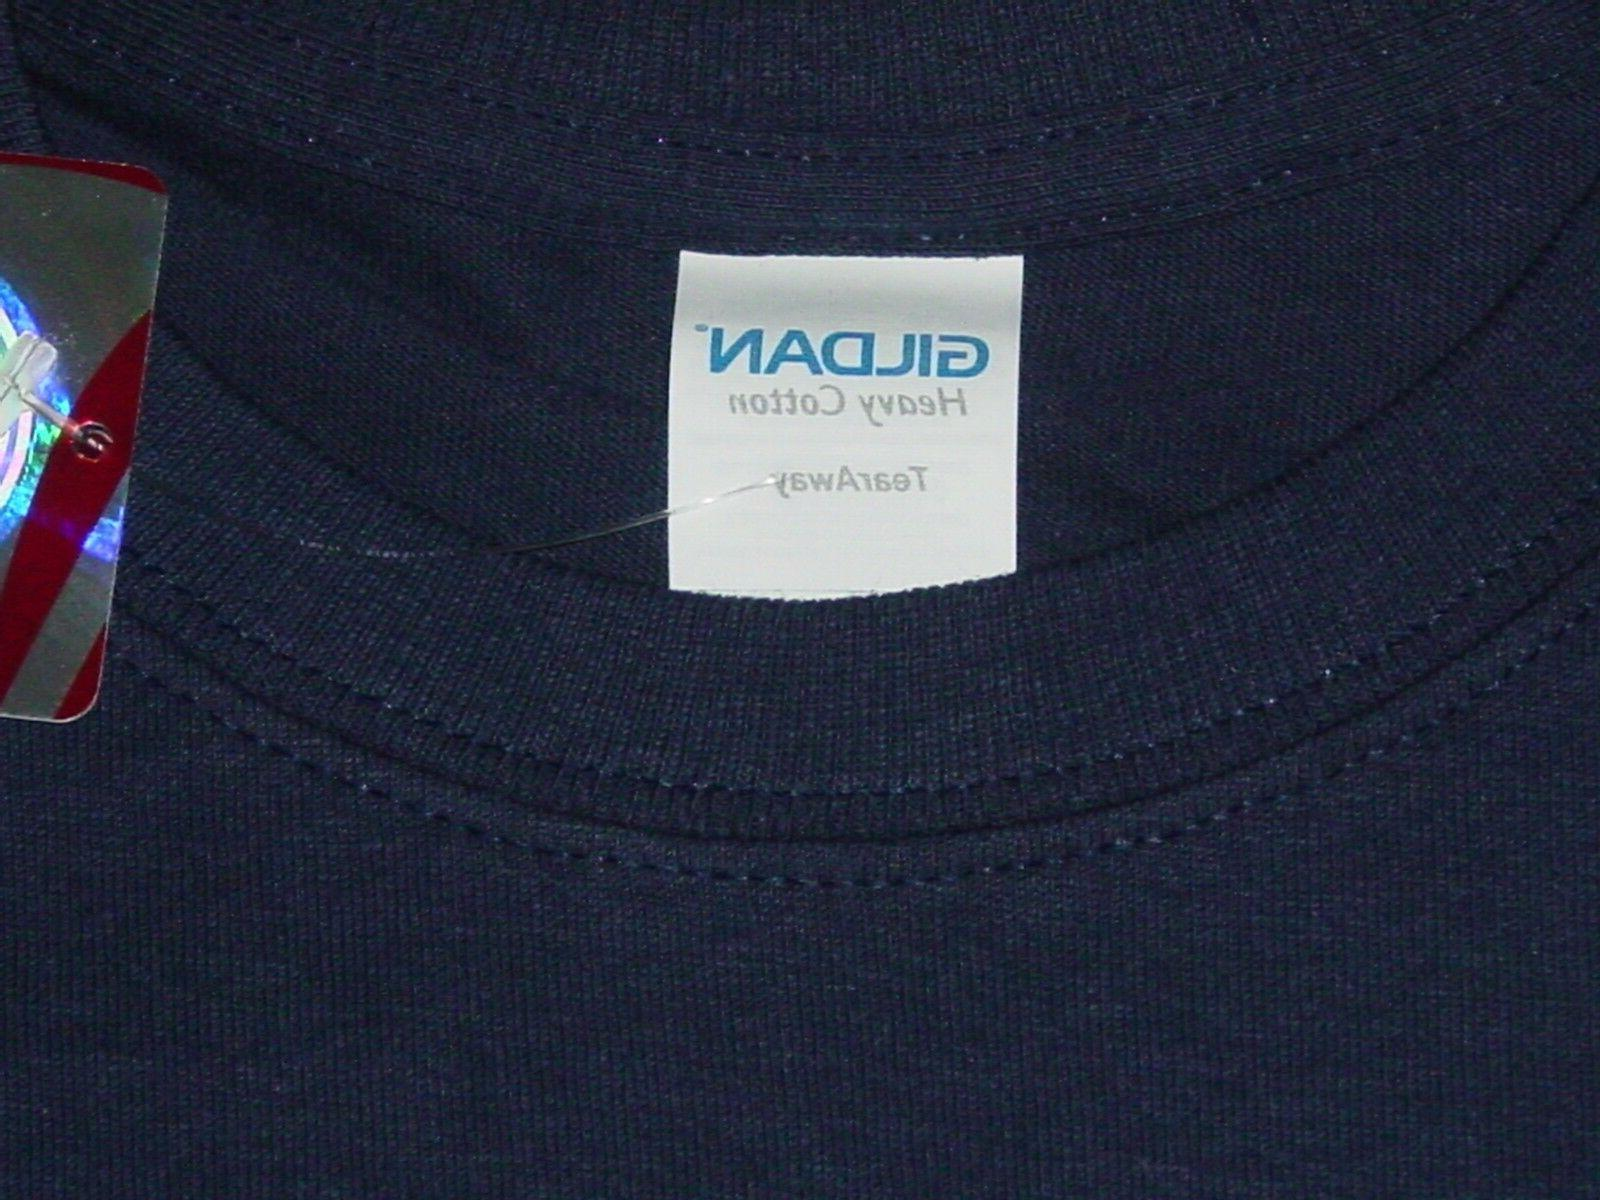 DU DUQUESNE University DUKES T-Shirt - TAGS ... MEDIUM